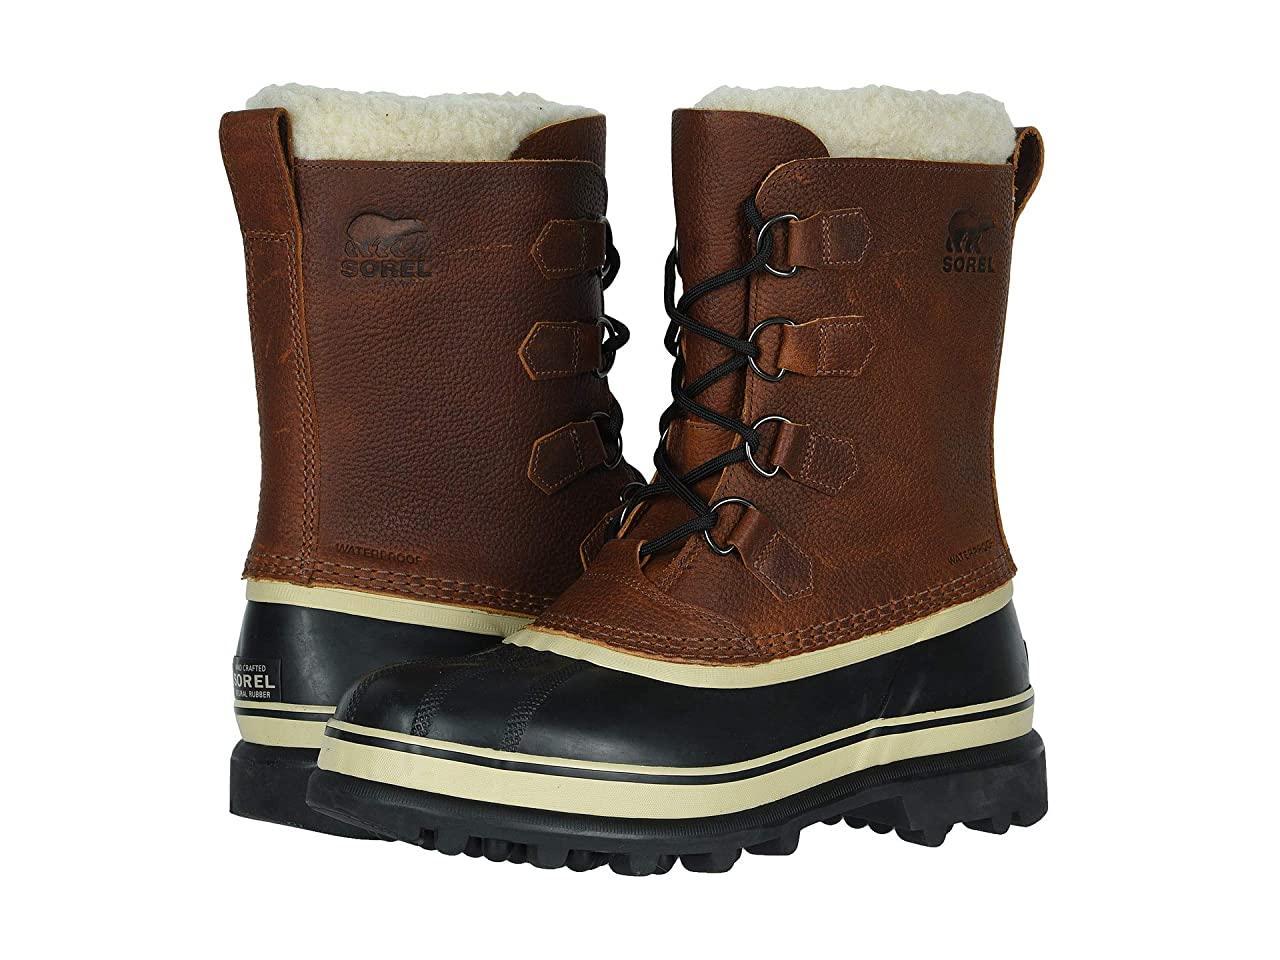 Ботинки/Сапоги (Оригинал) SOREL Caribou Wool Tobacco